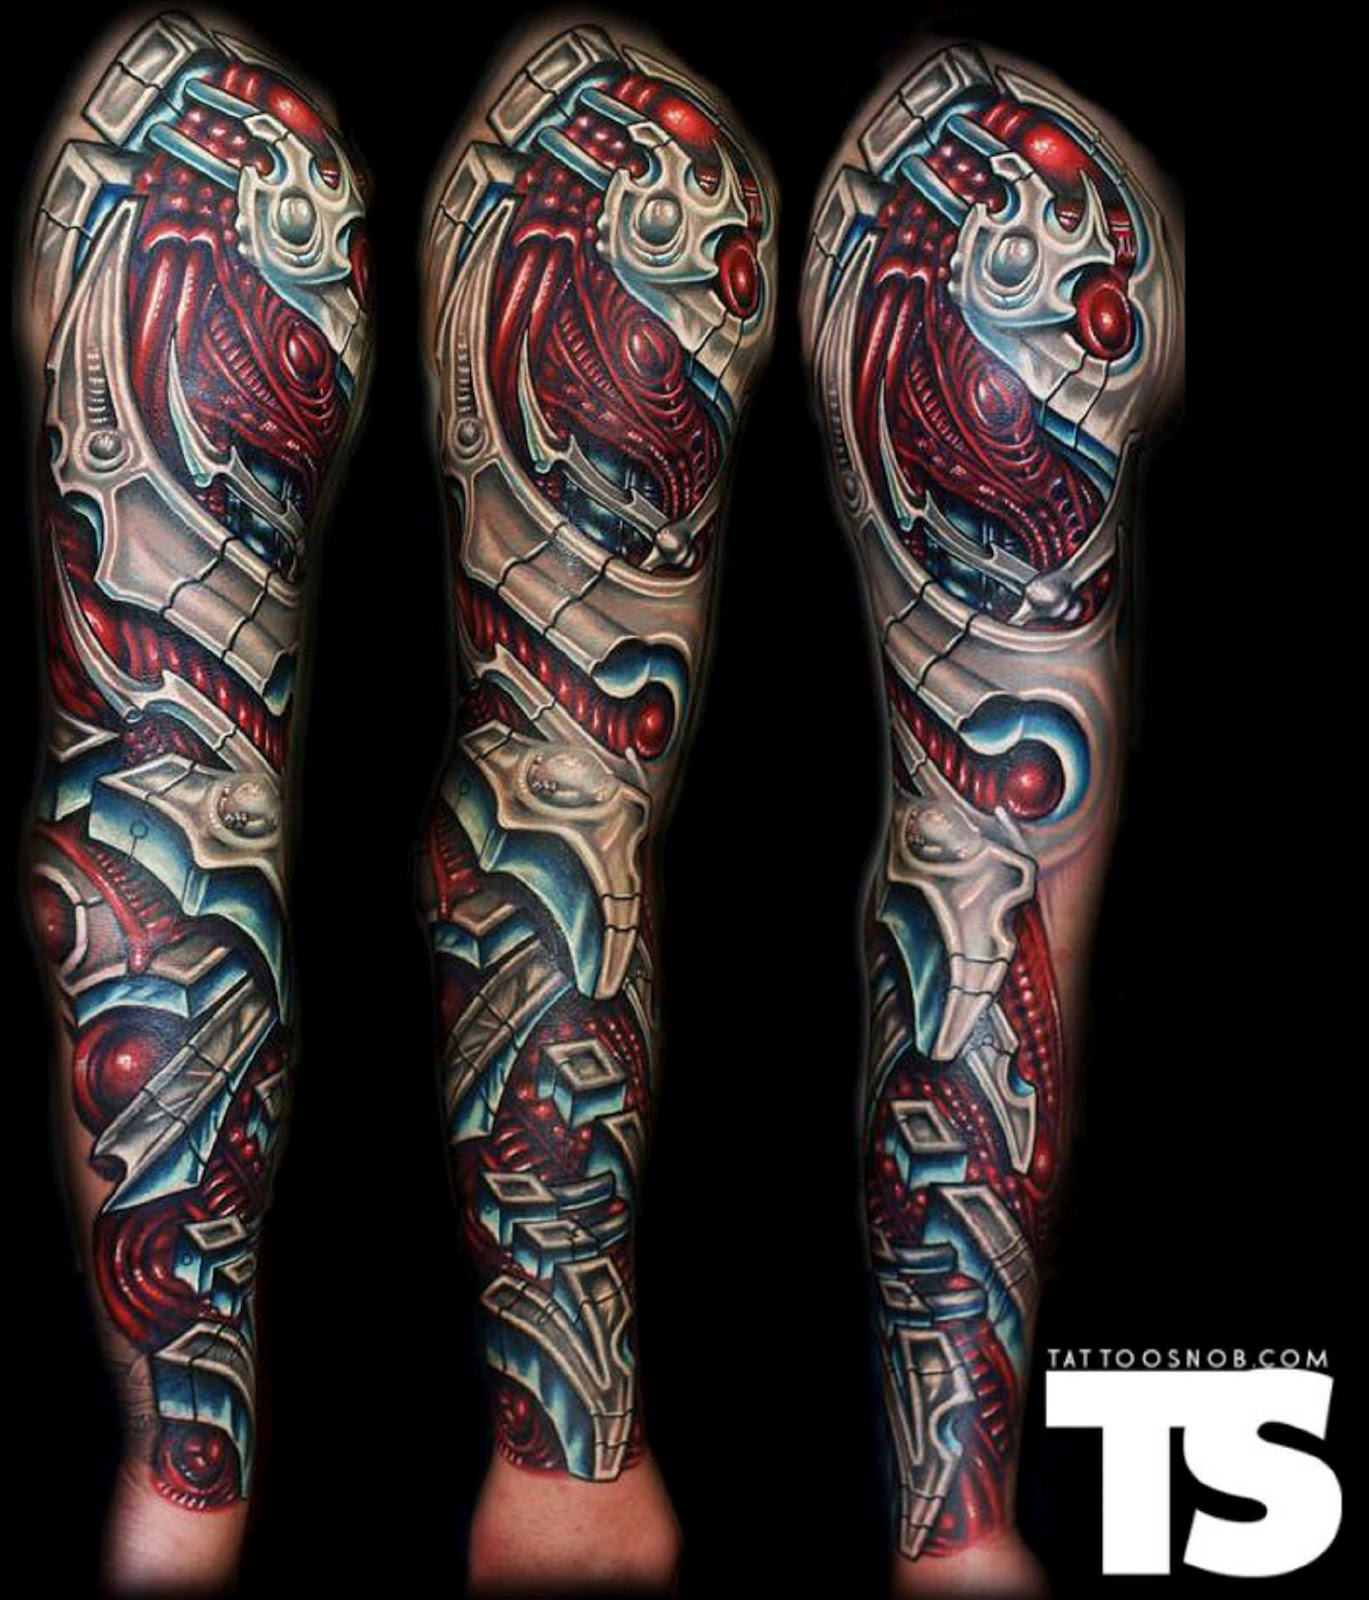 Tato 3d Keren Pictures to Pin on Pinterest - TattoosKid